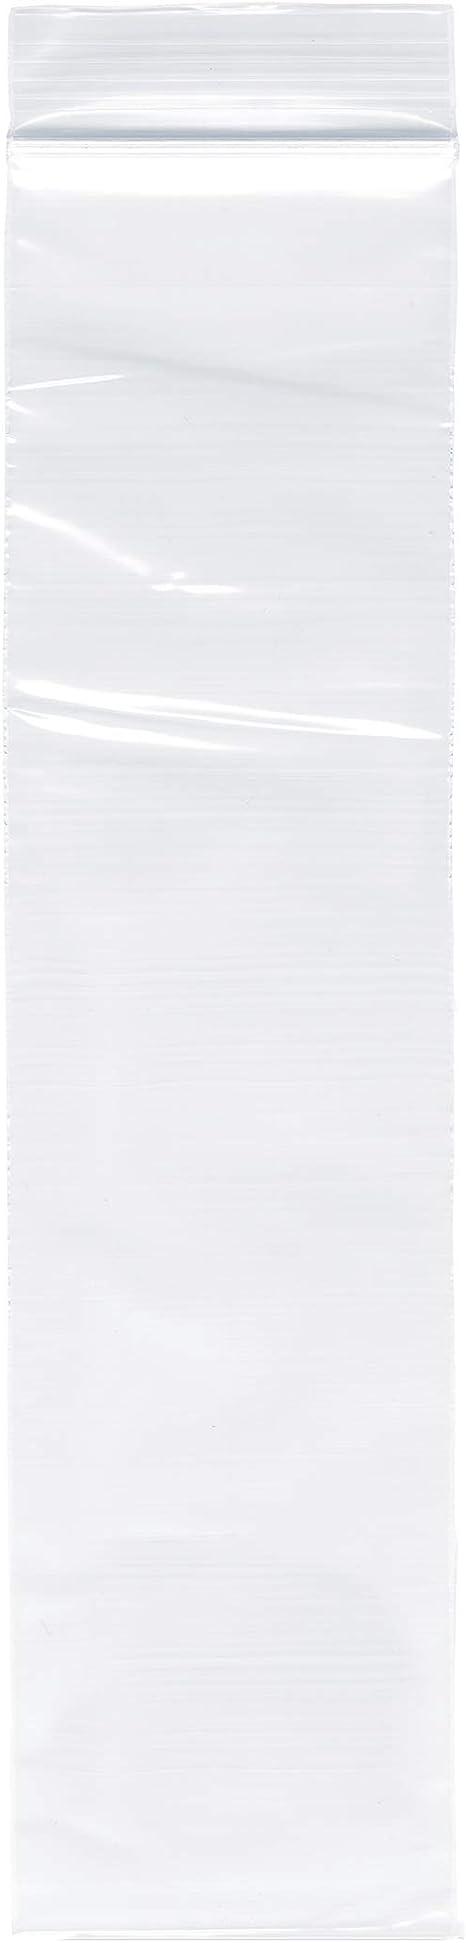 2 x 8 Pack of 200 2 Mil Plymor Zipper Reclosable Plastic Bags